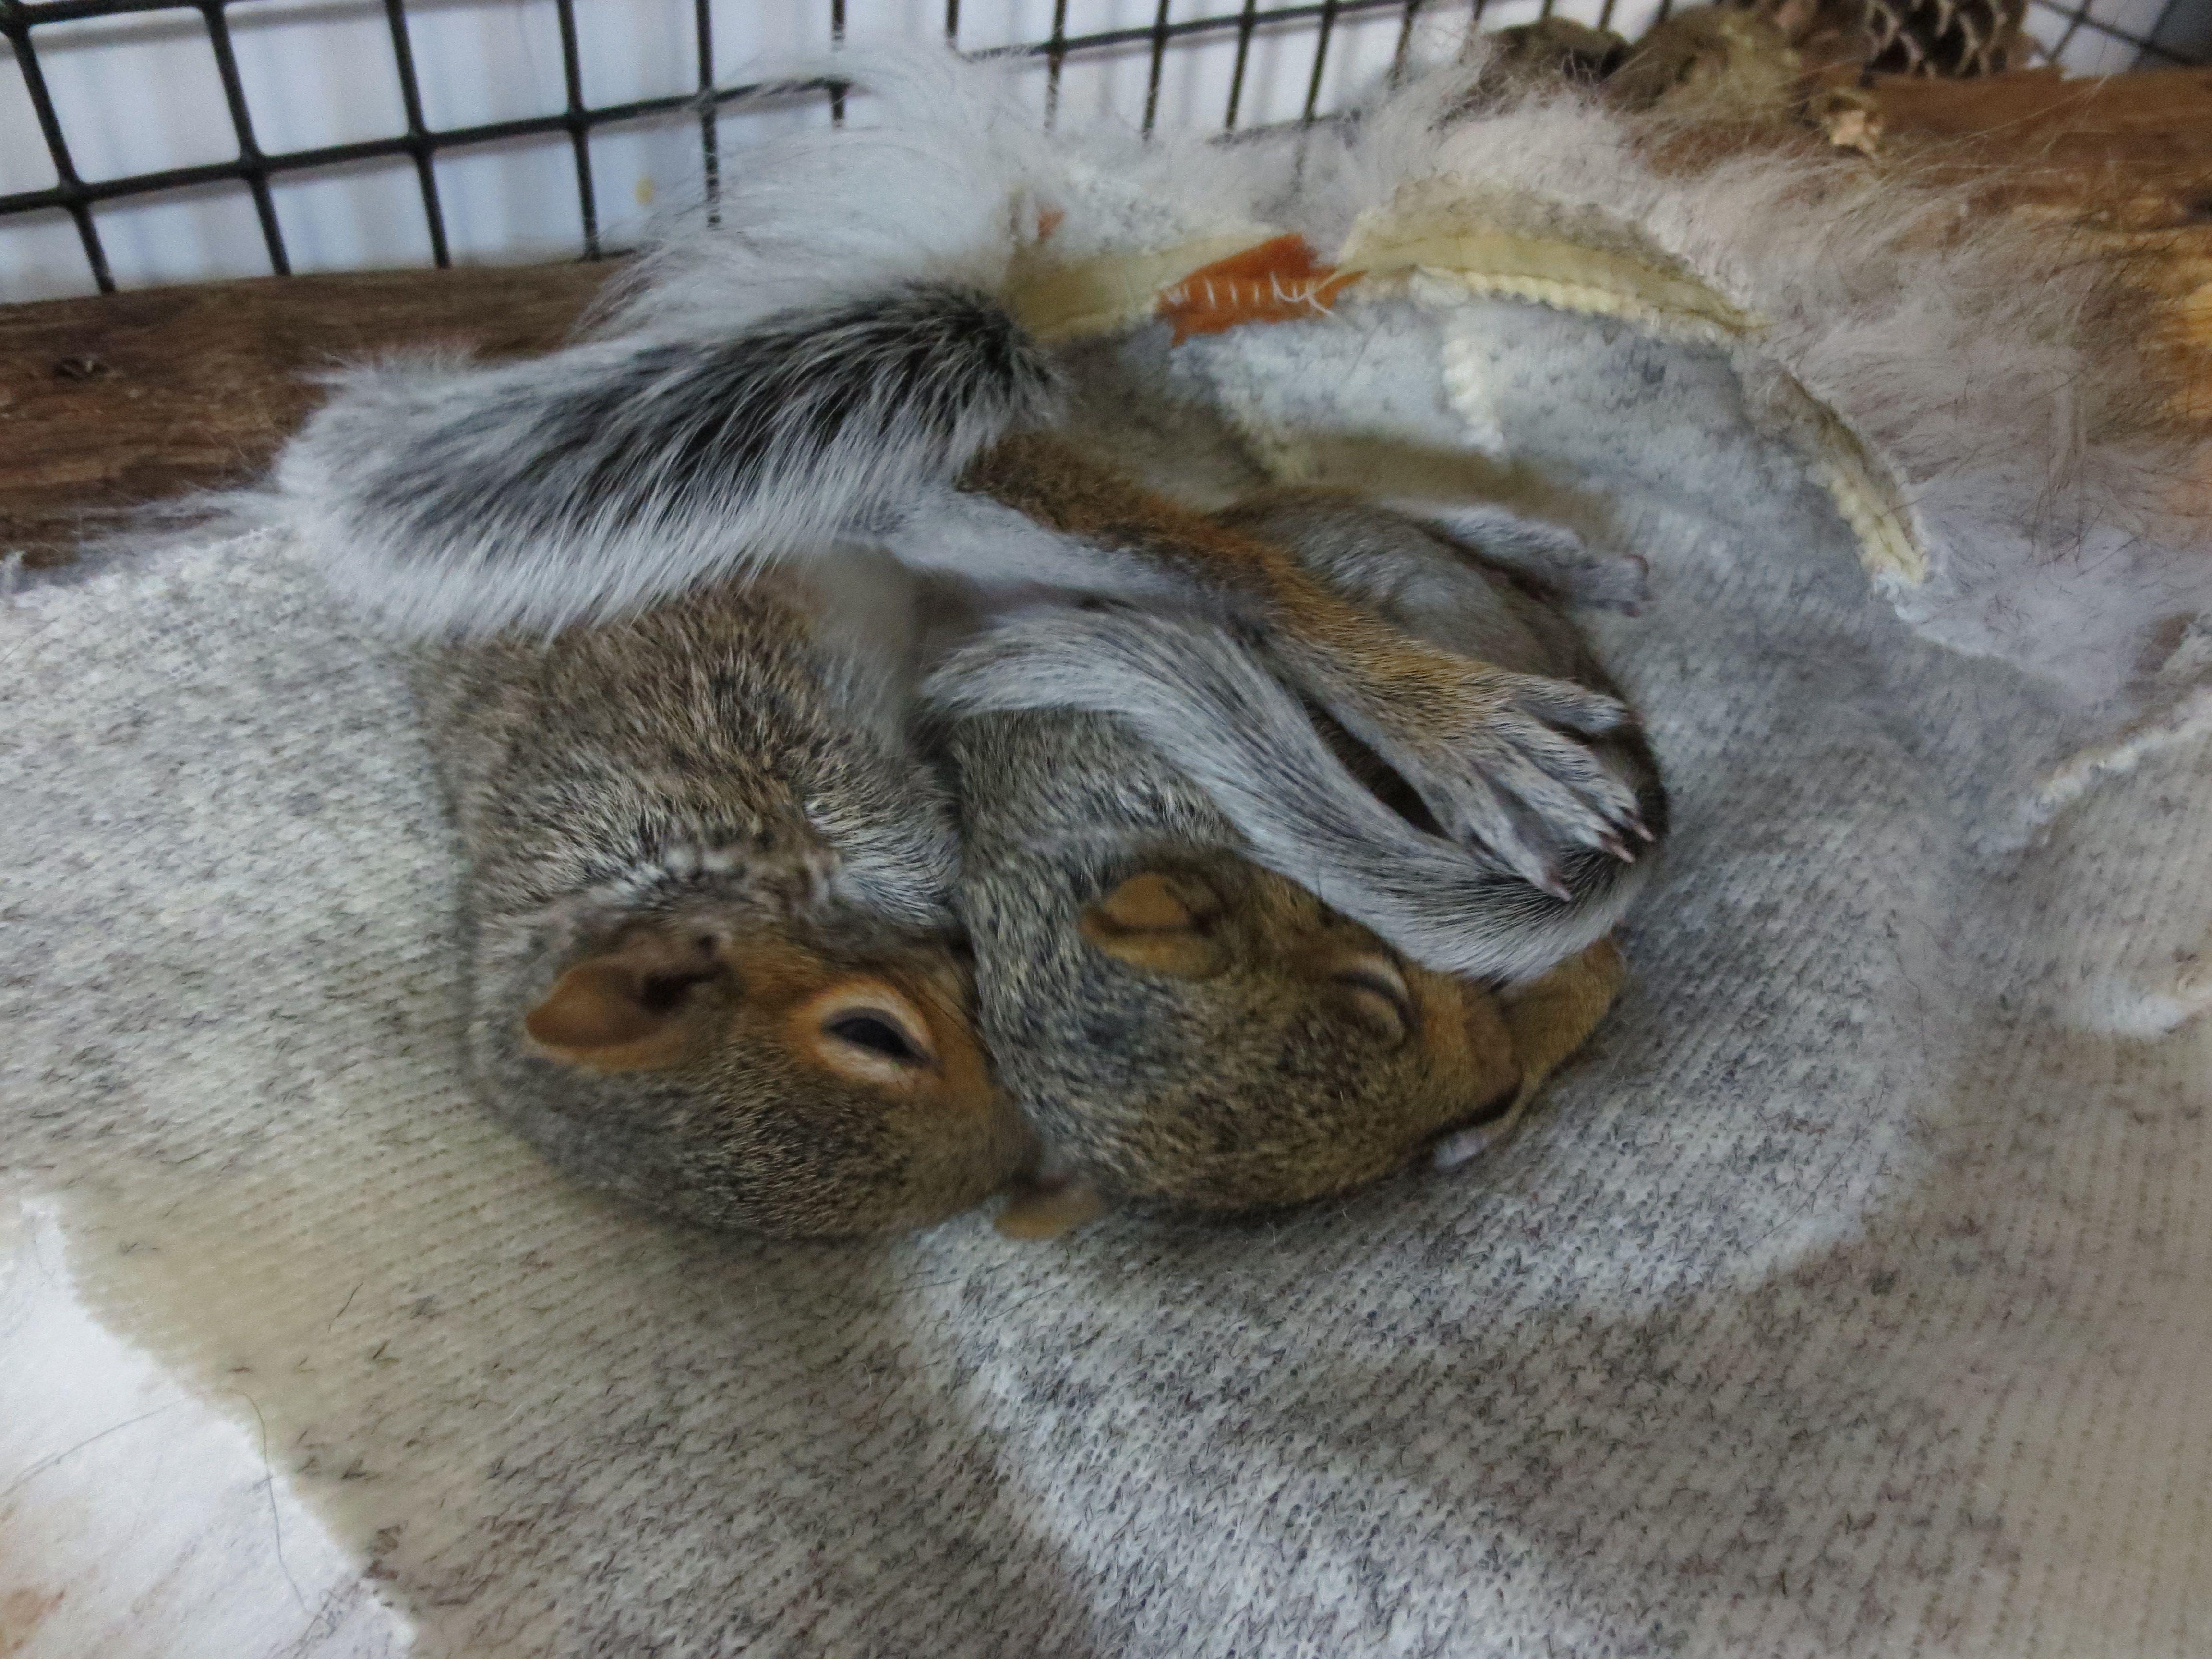 Baby squirrels barry lola wildlife rehabilitation pinterest baby squirrels barry lola geenschuldenfo Choice Image